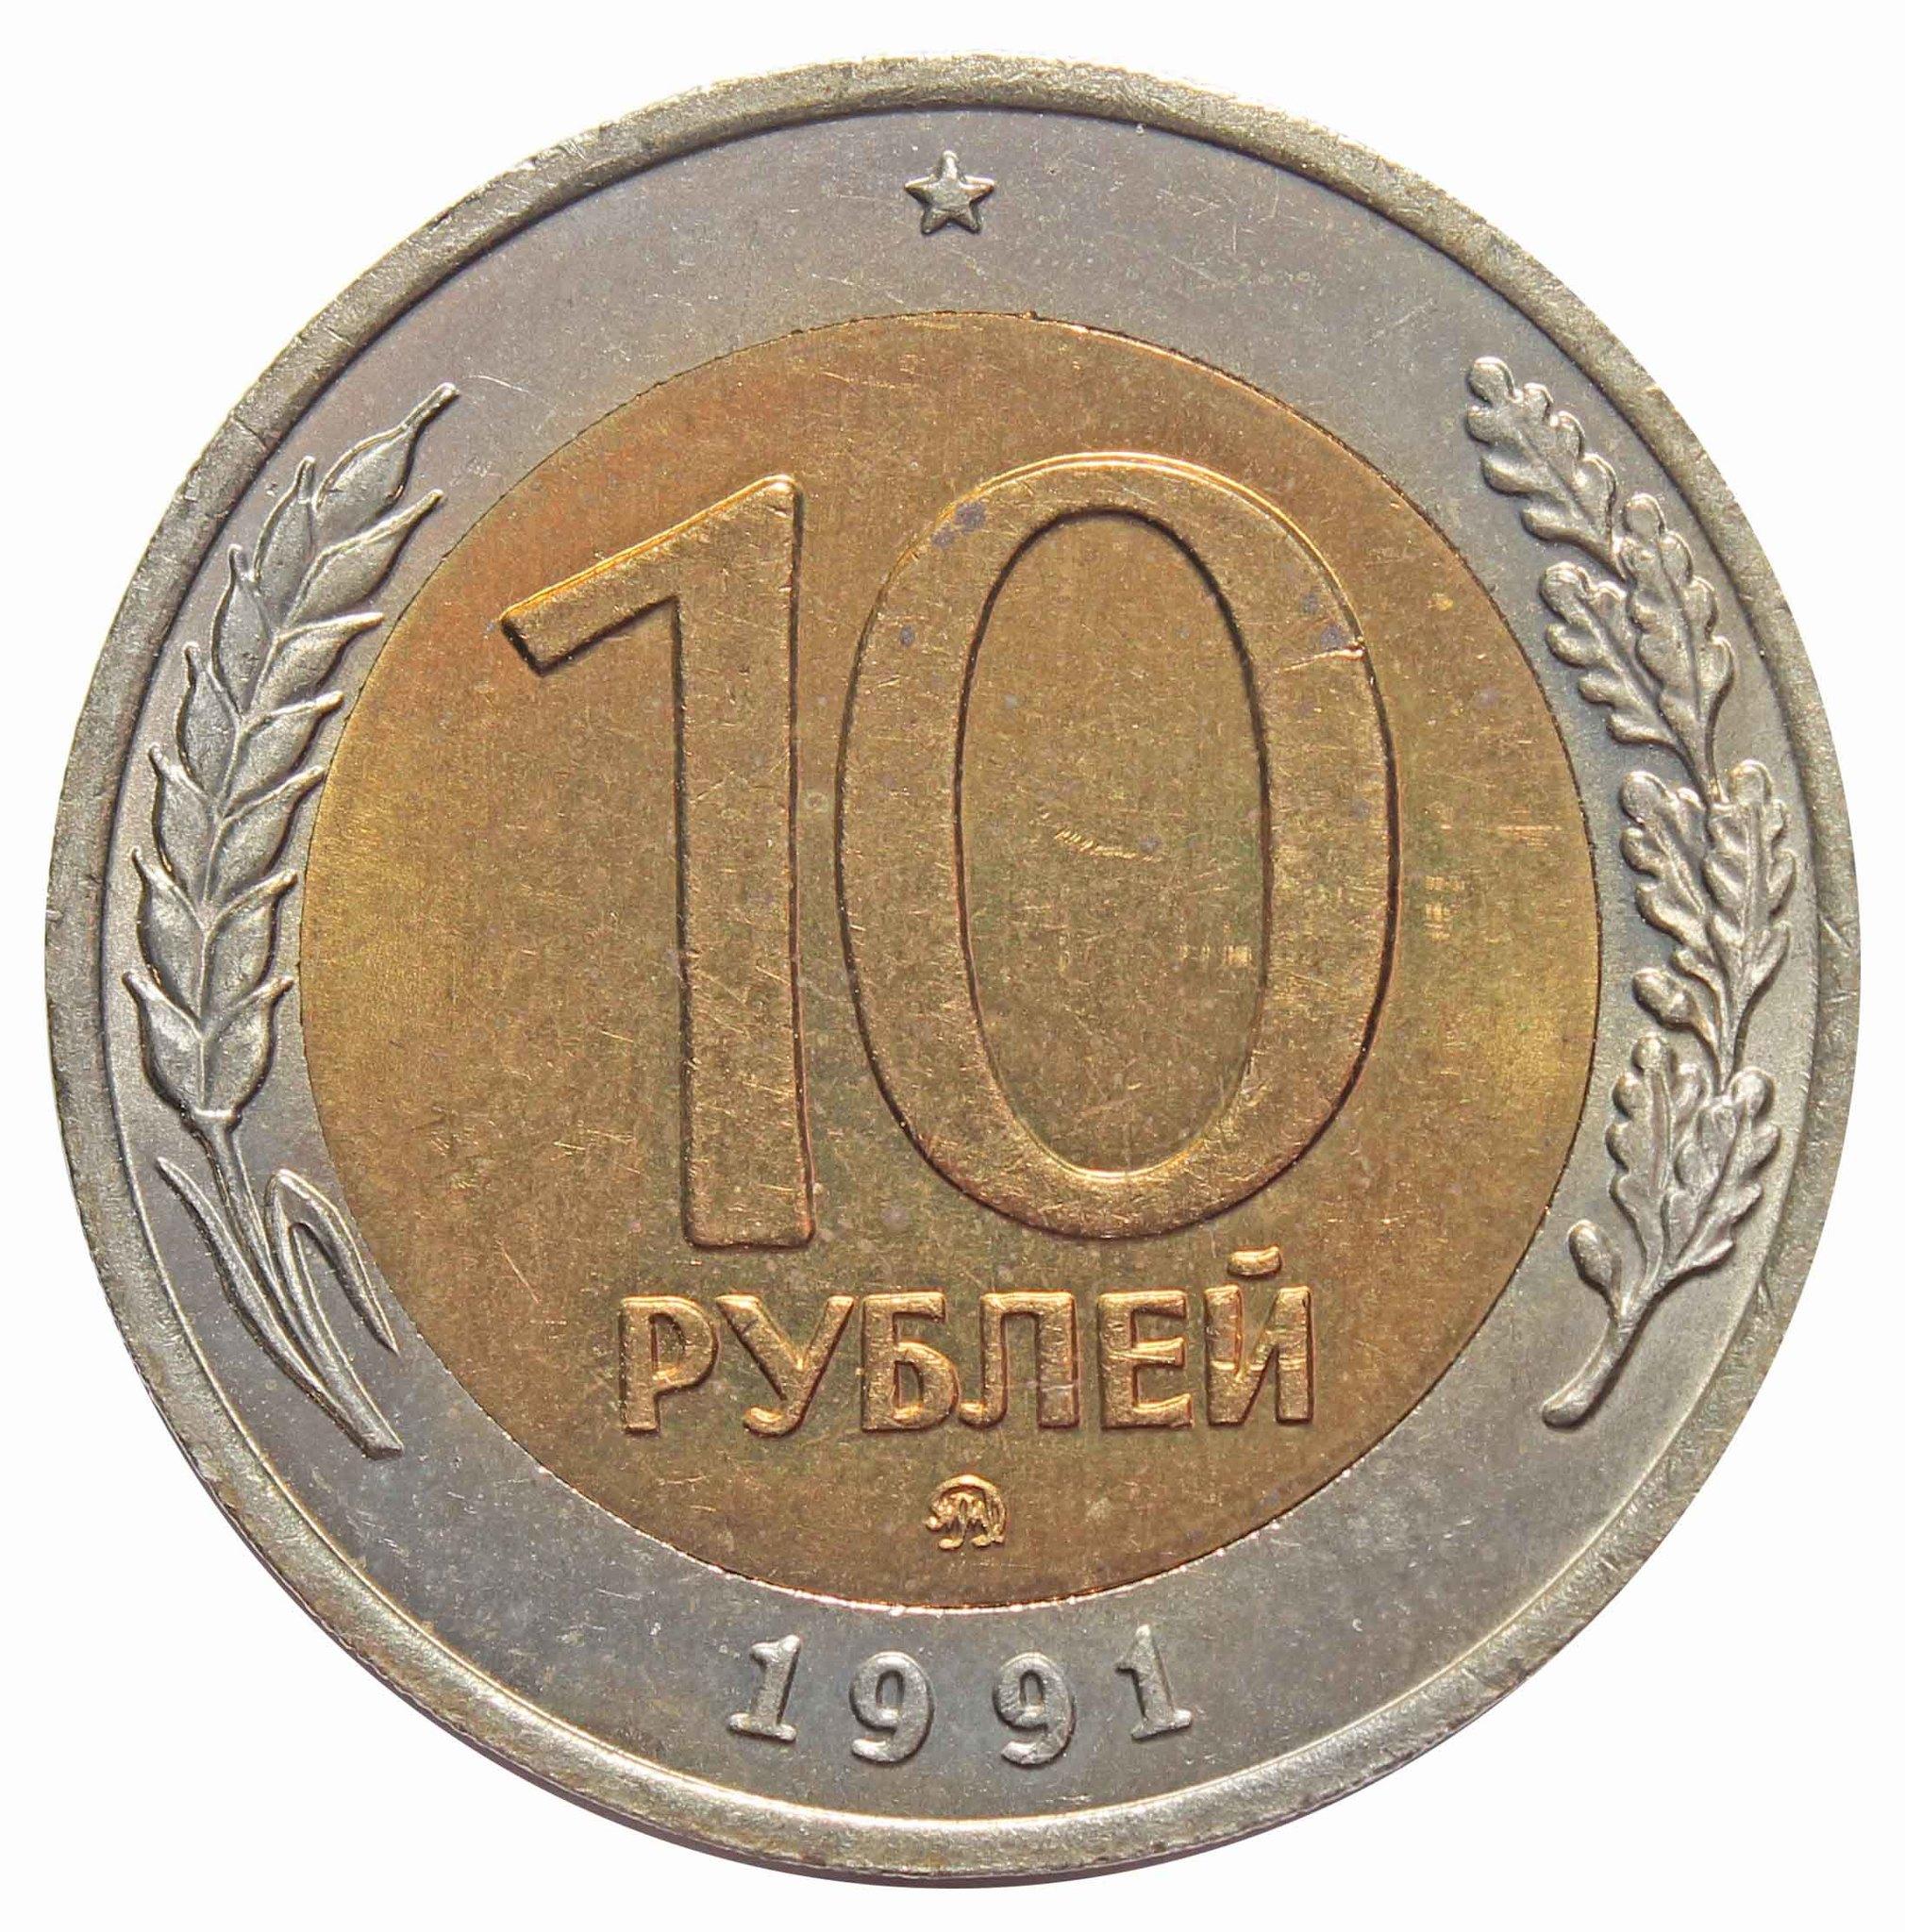 10 рублей 1991 год ММД XF №3